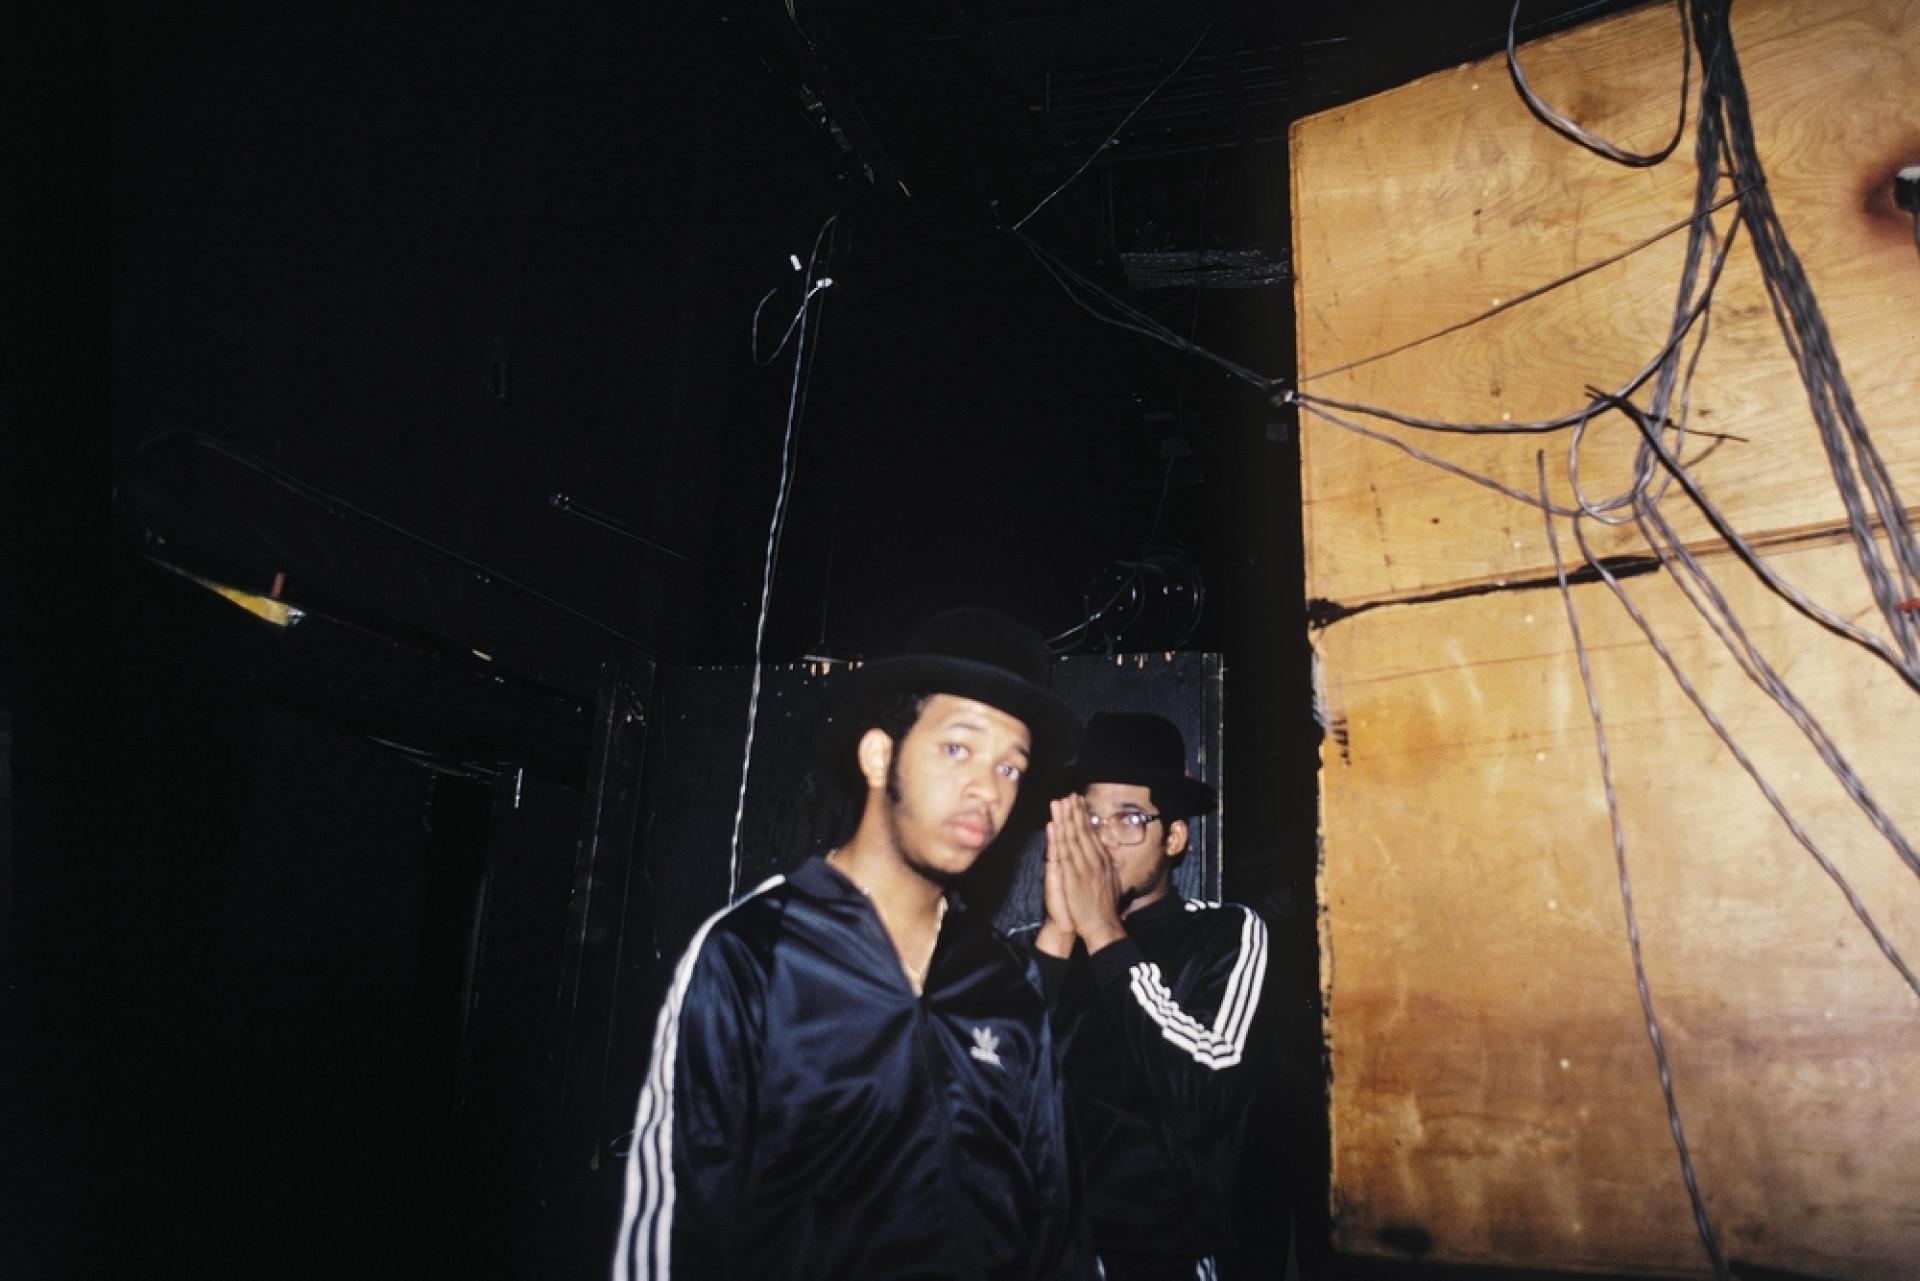 Les rappeurs stars de Run-DMC.